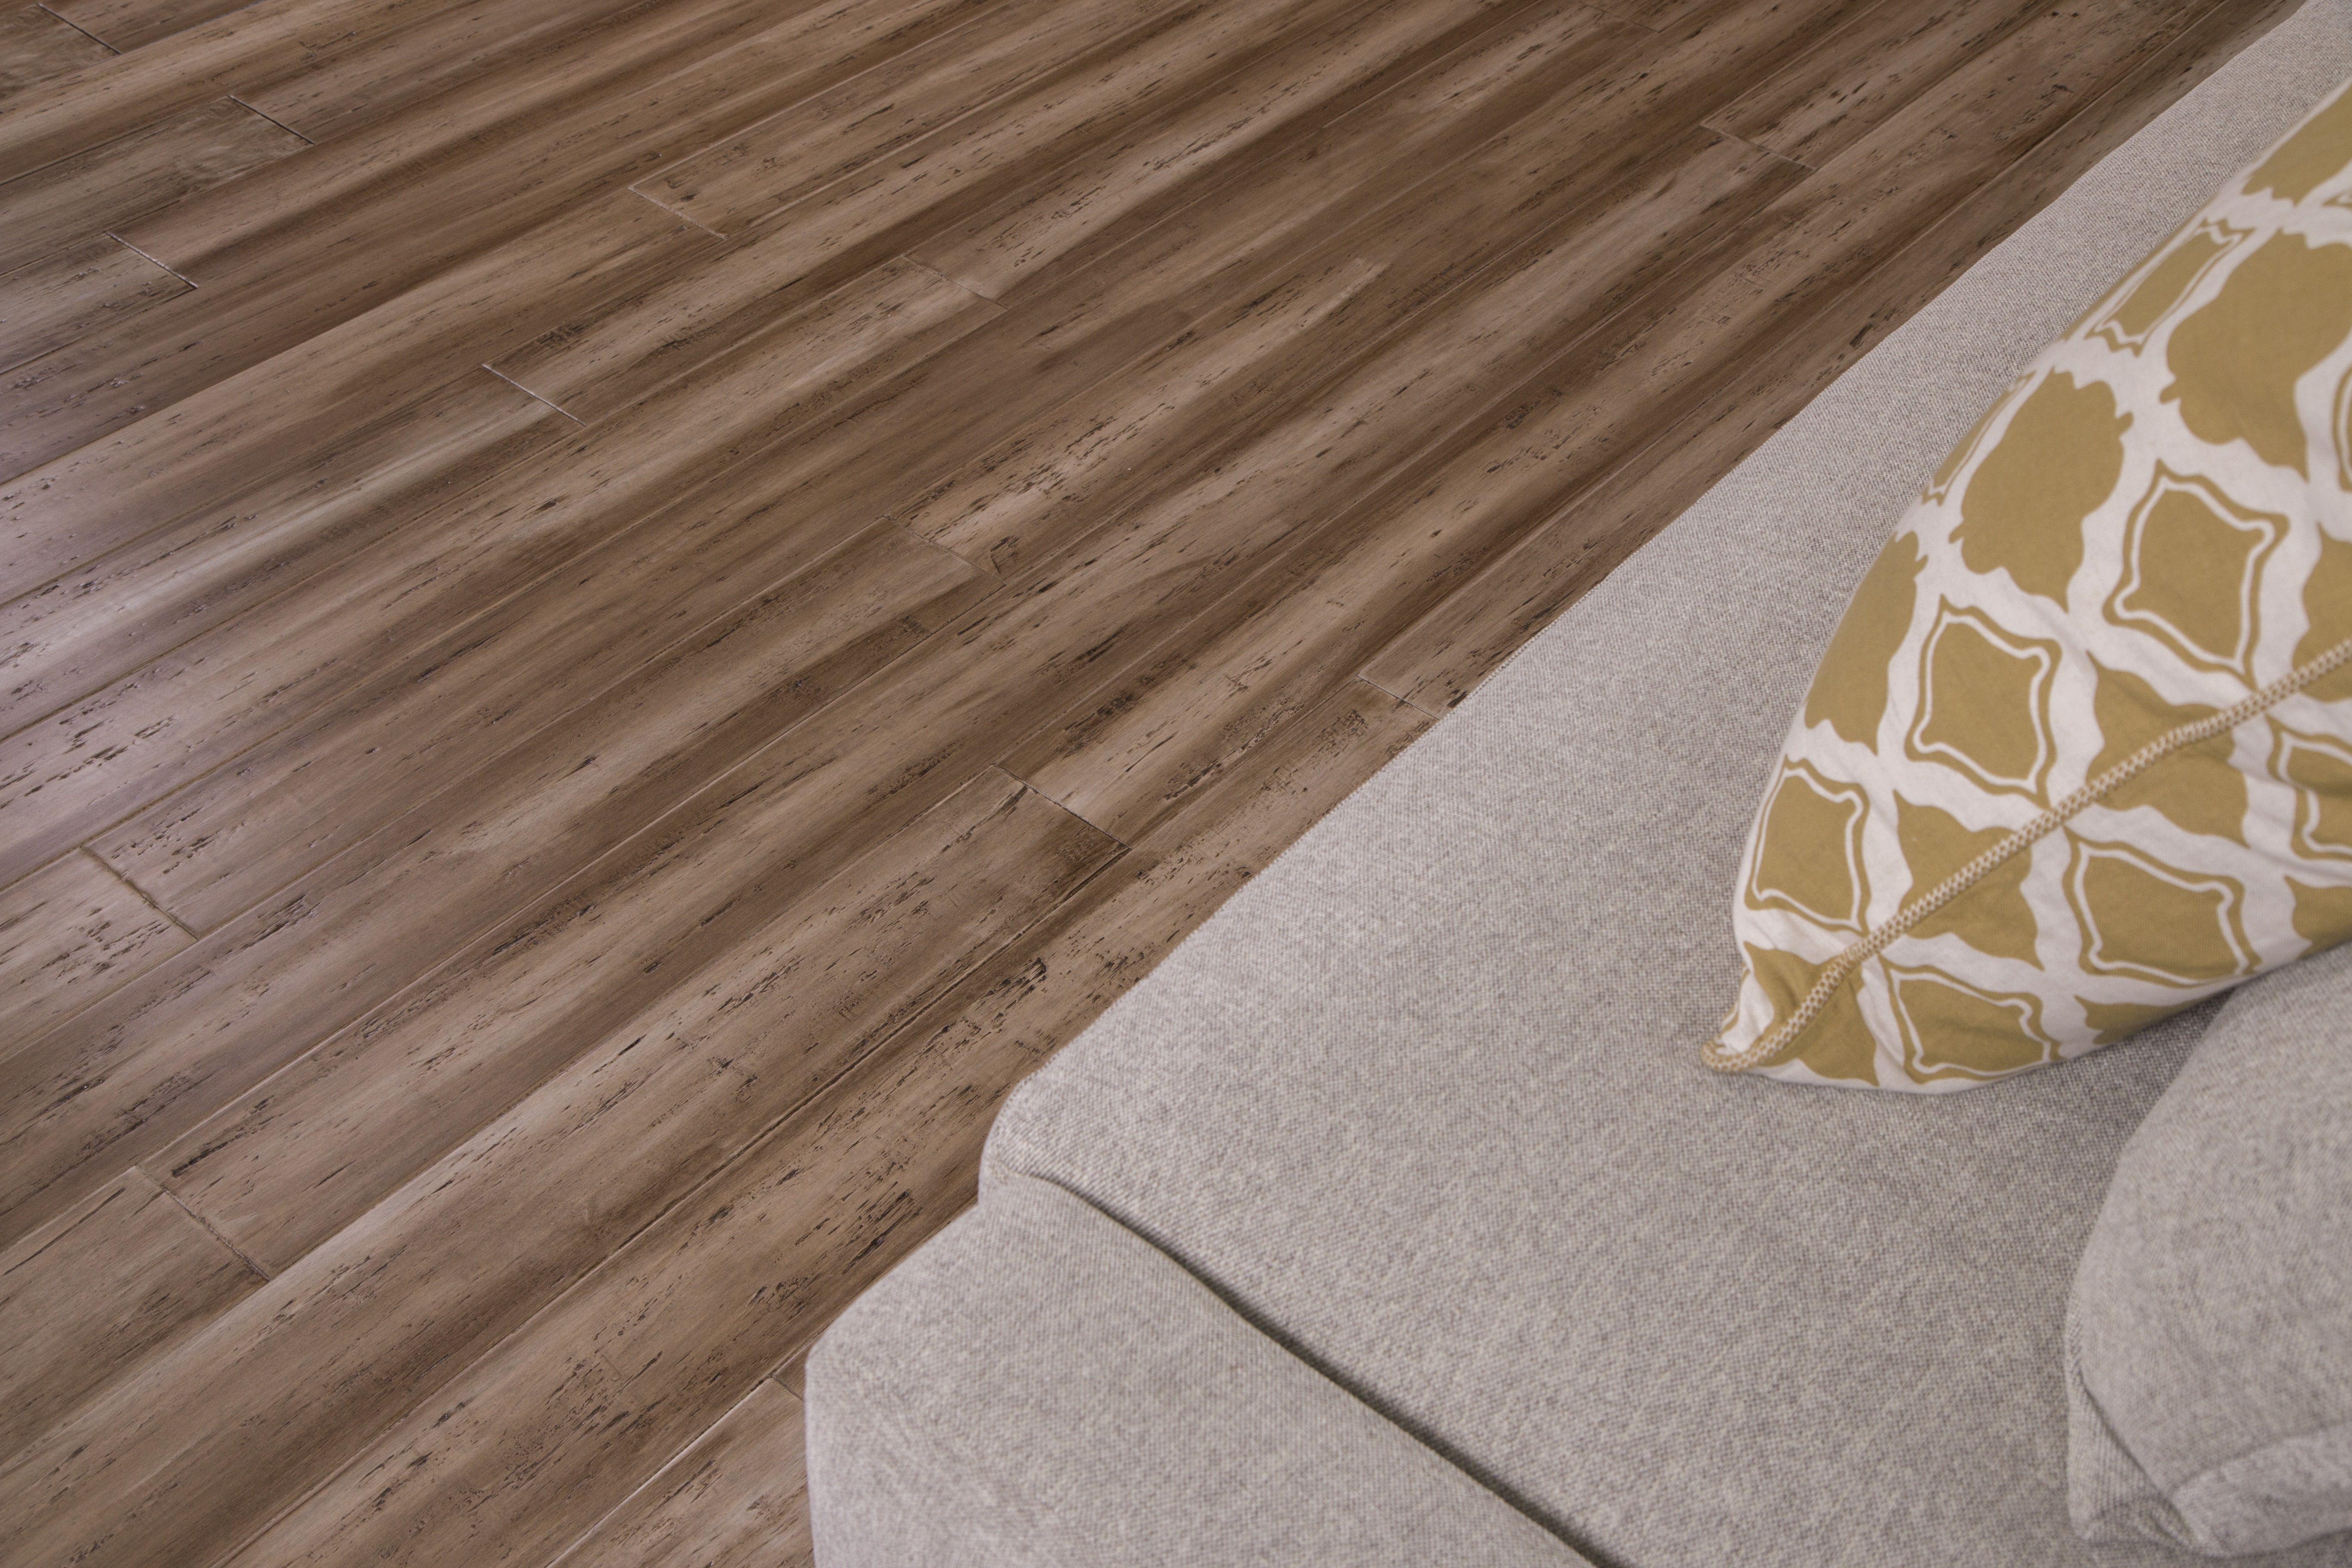 Savanna Bamboo Flooring Chart Topping